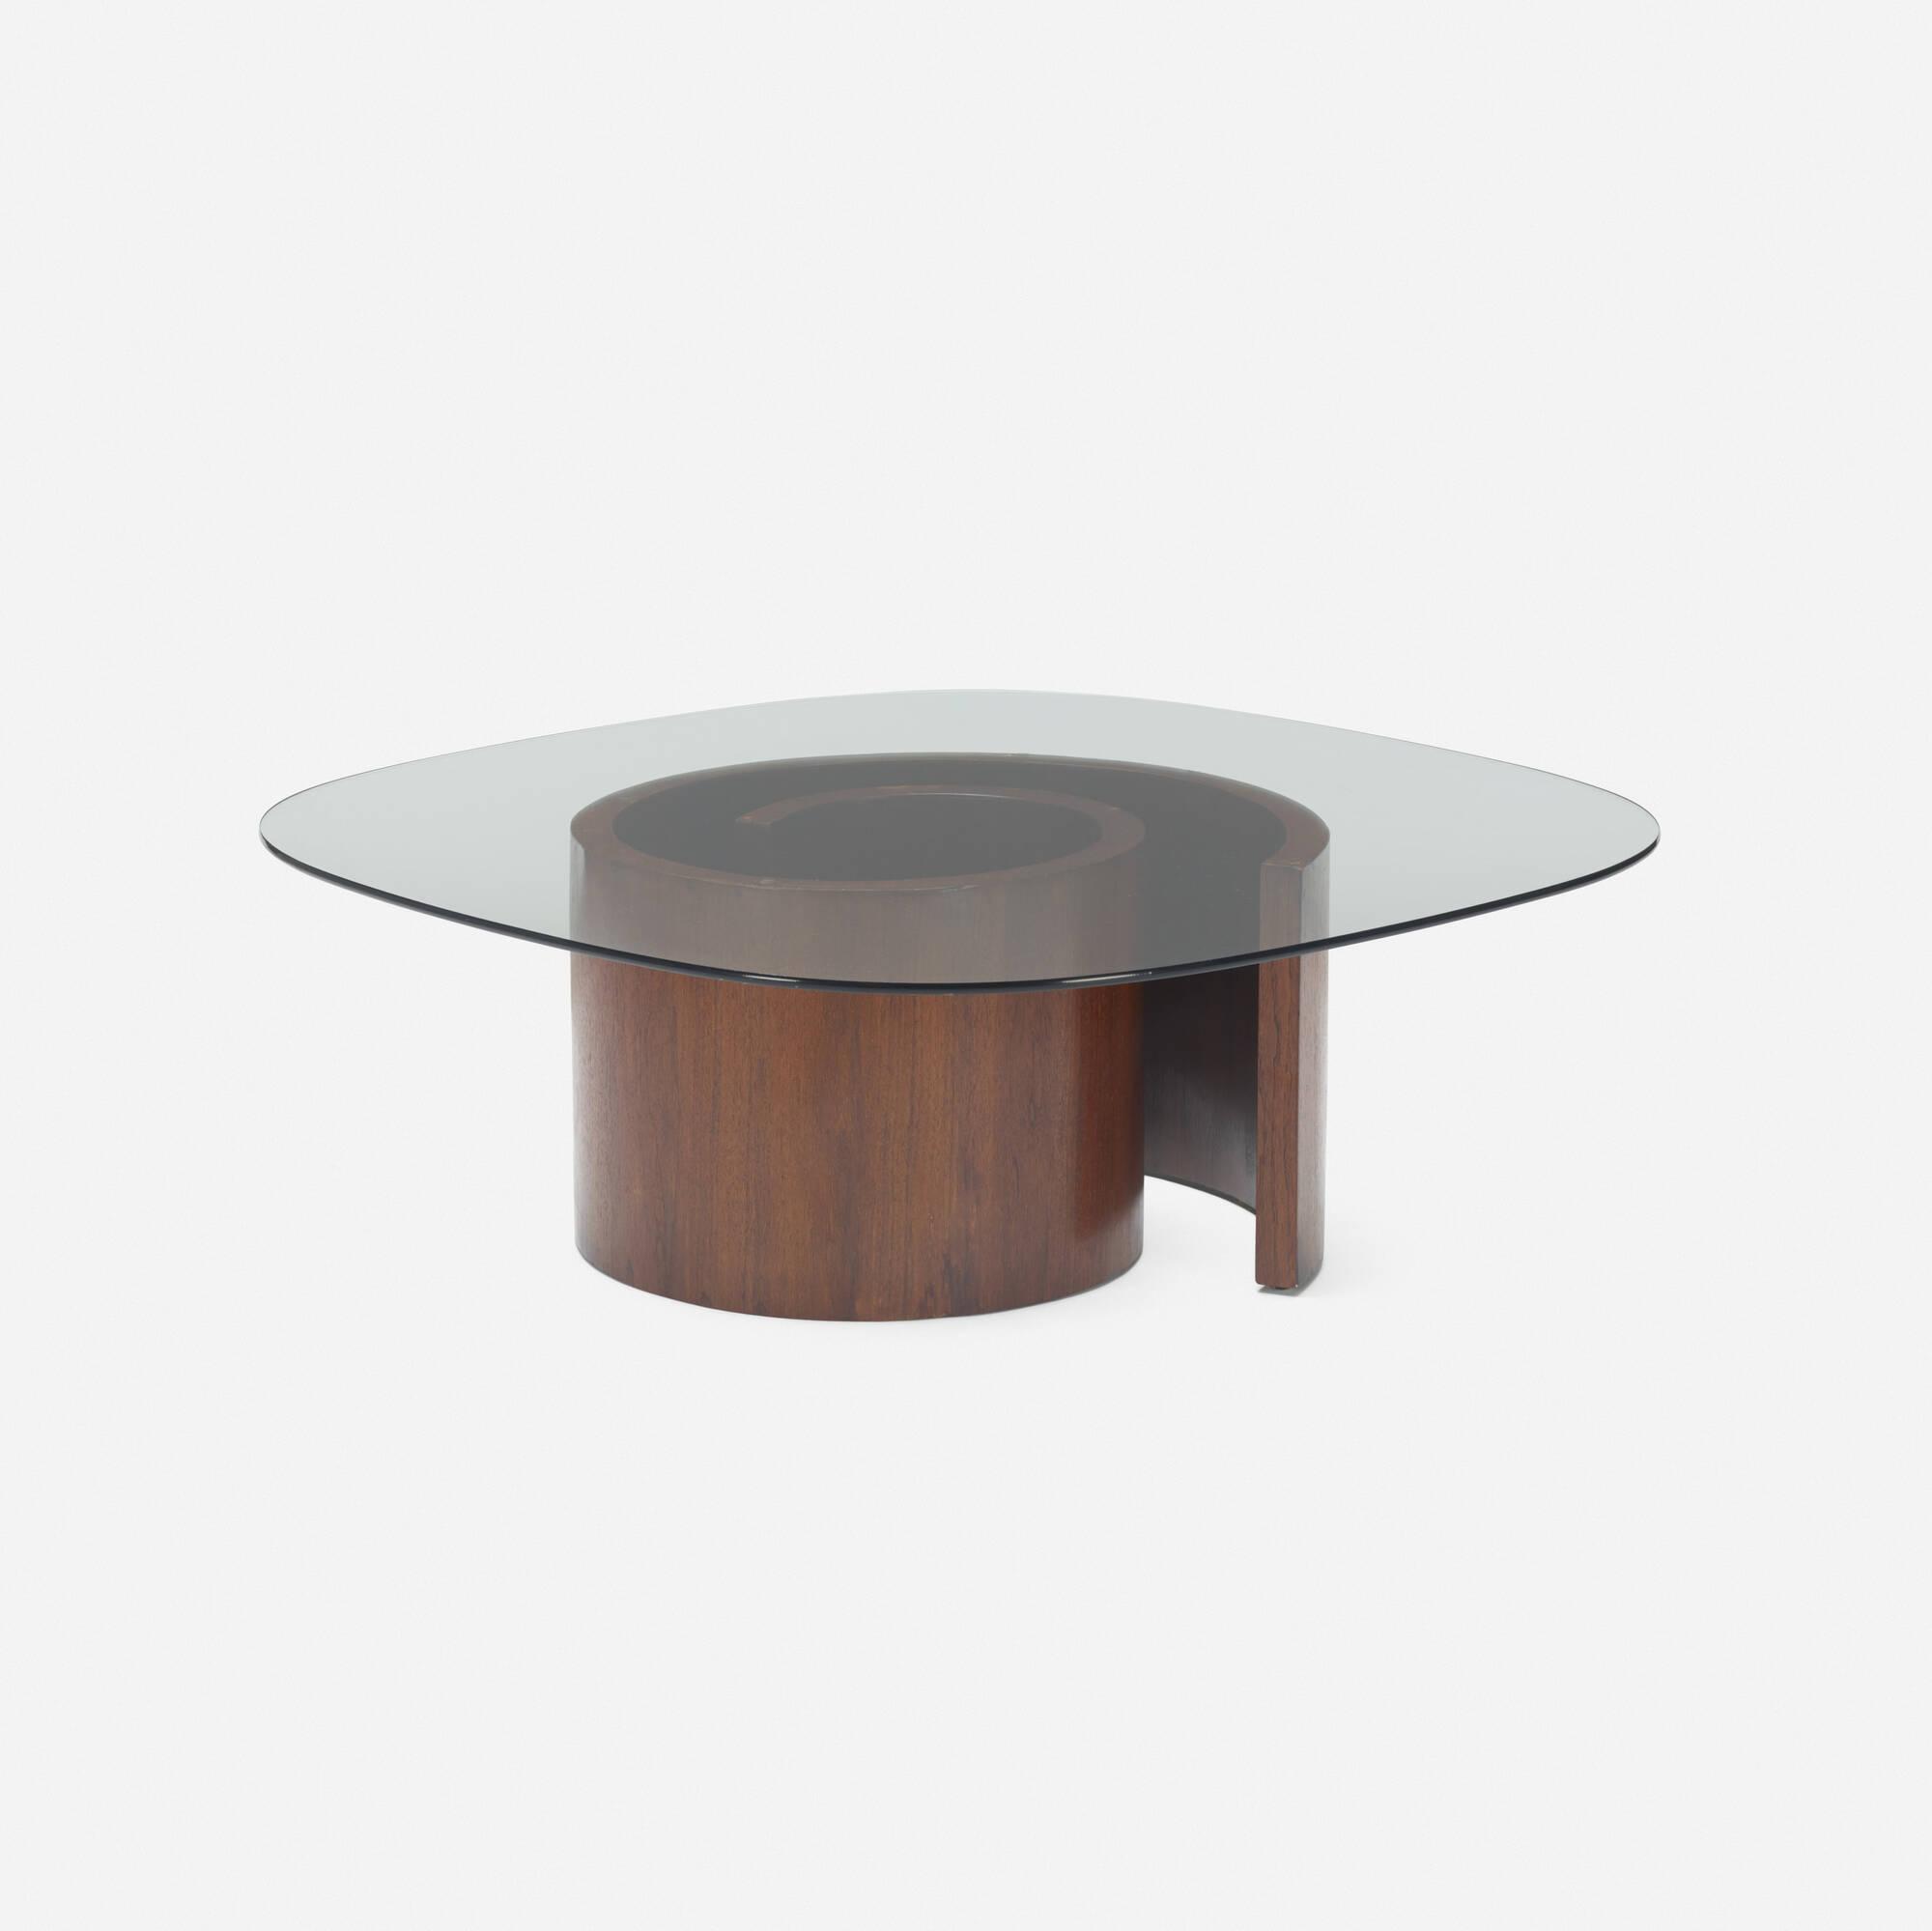 Good 149: Vladimir Kagan / Coffee Table (1 Of 1)